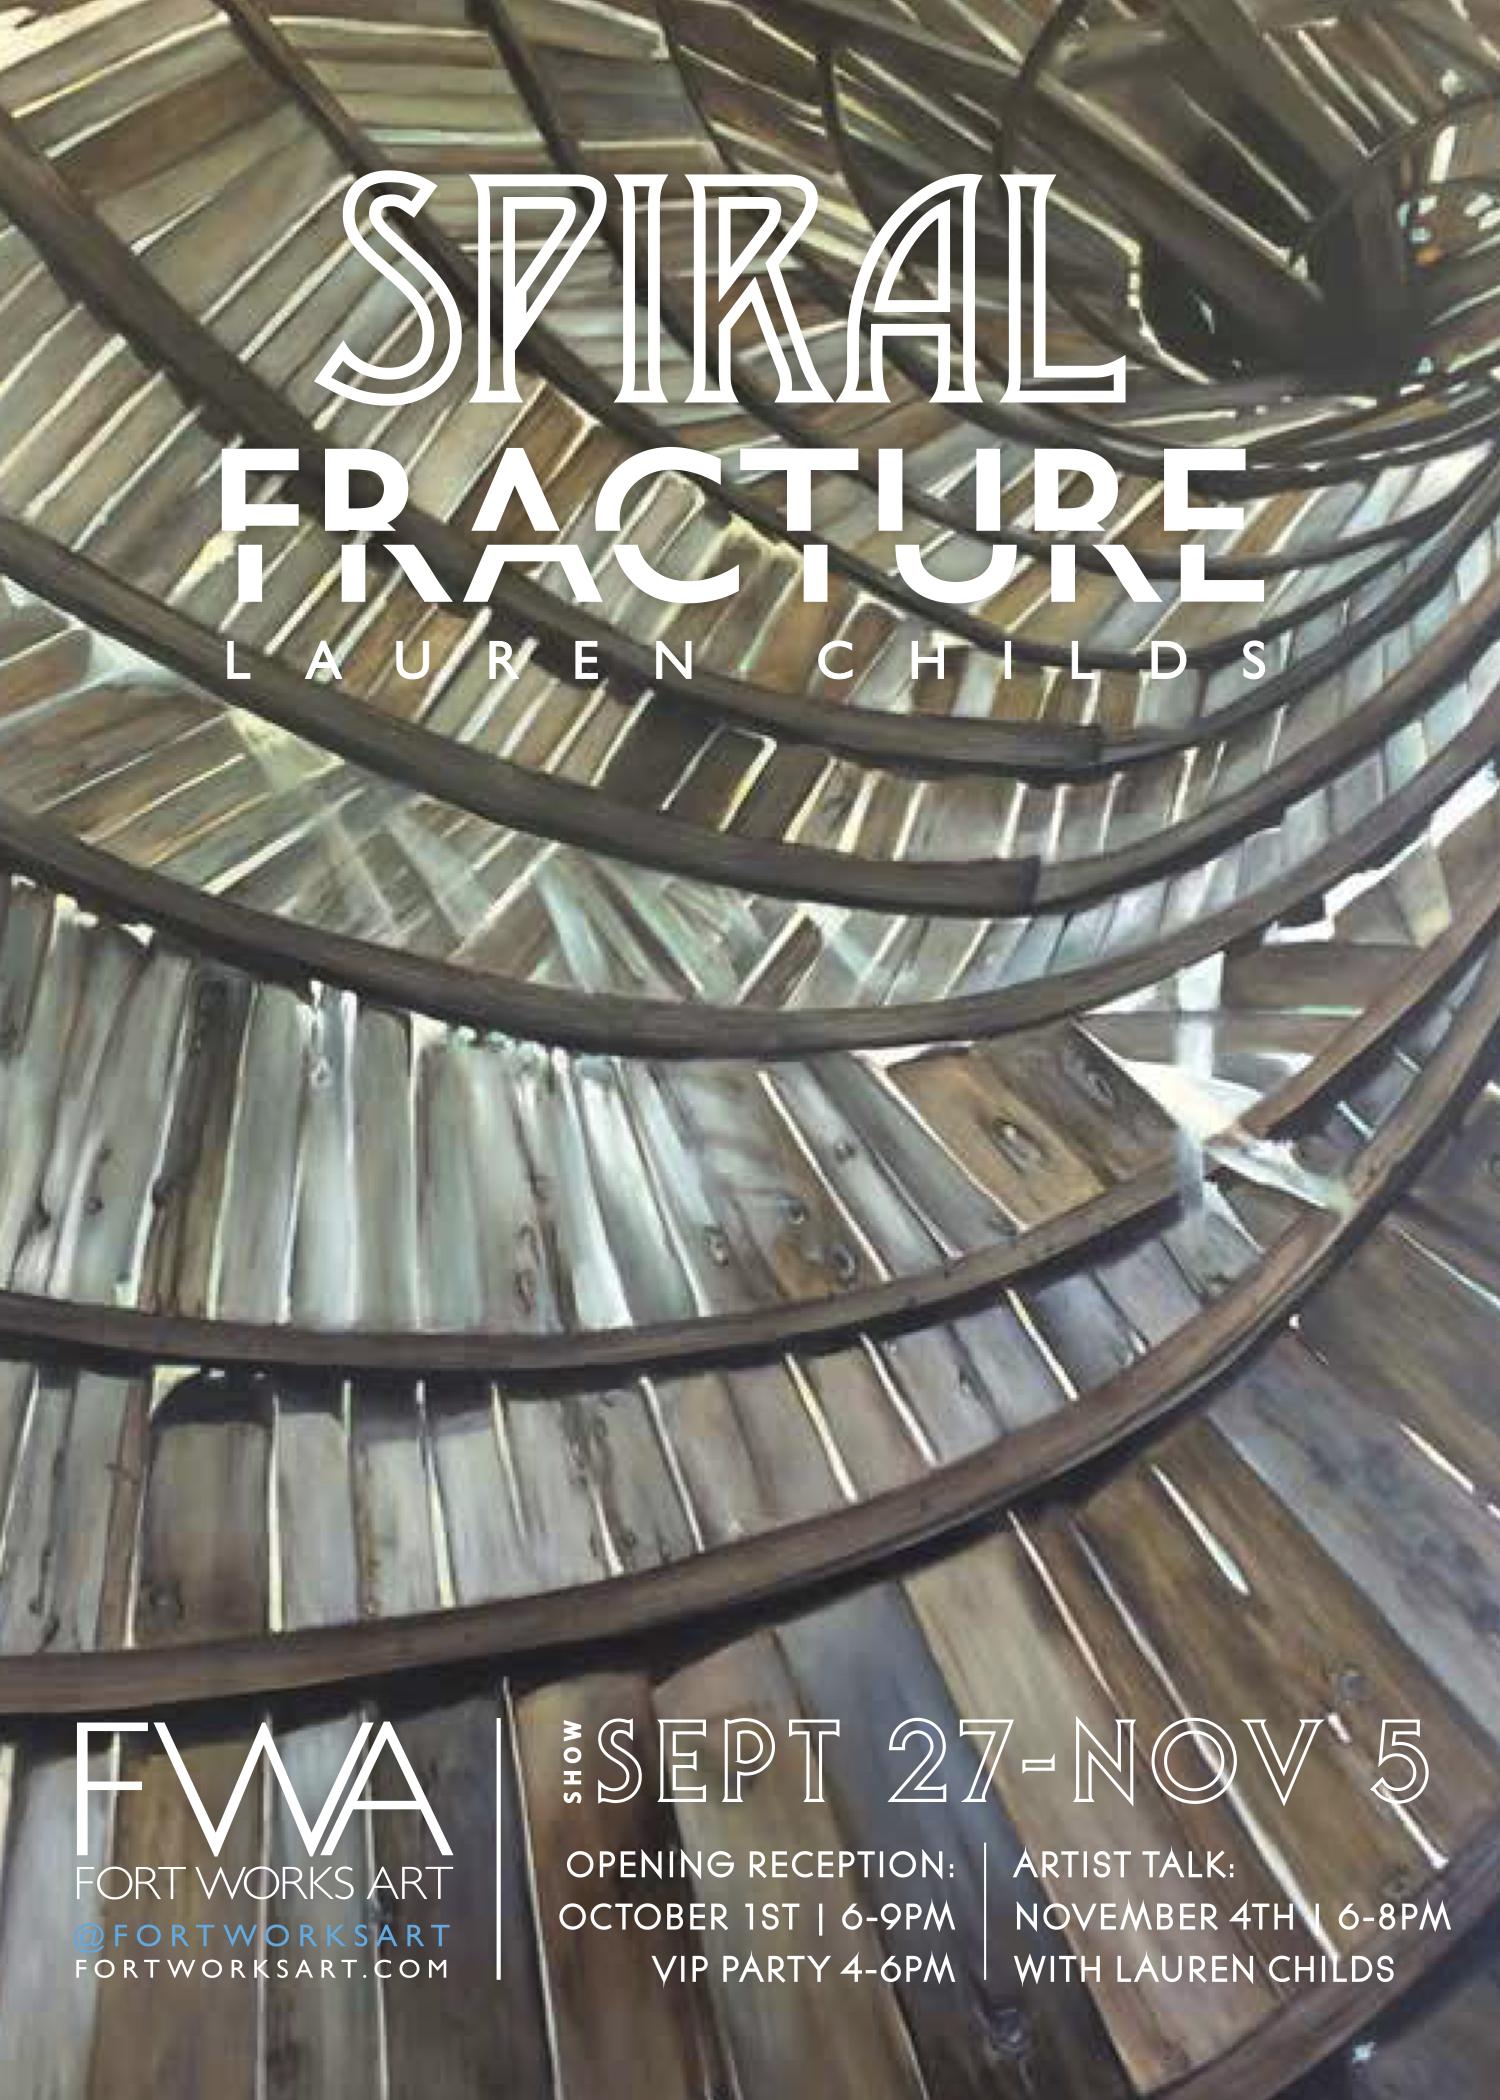 SpiralFracture5x7.jpg